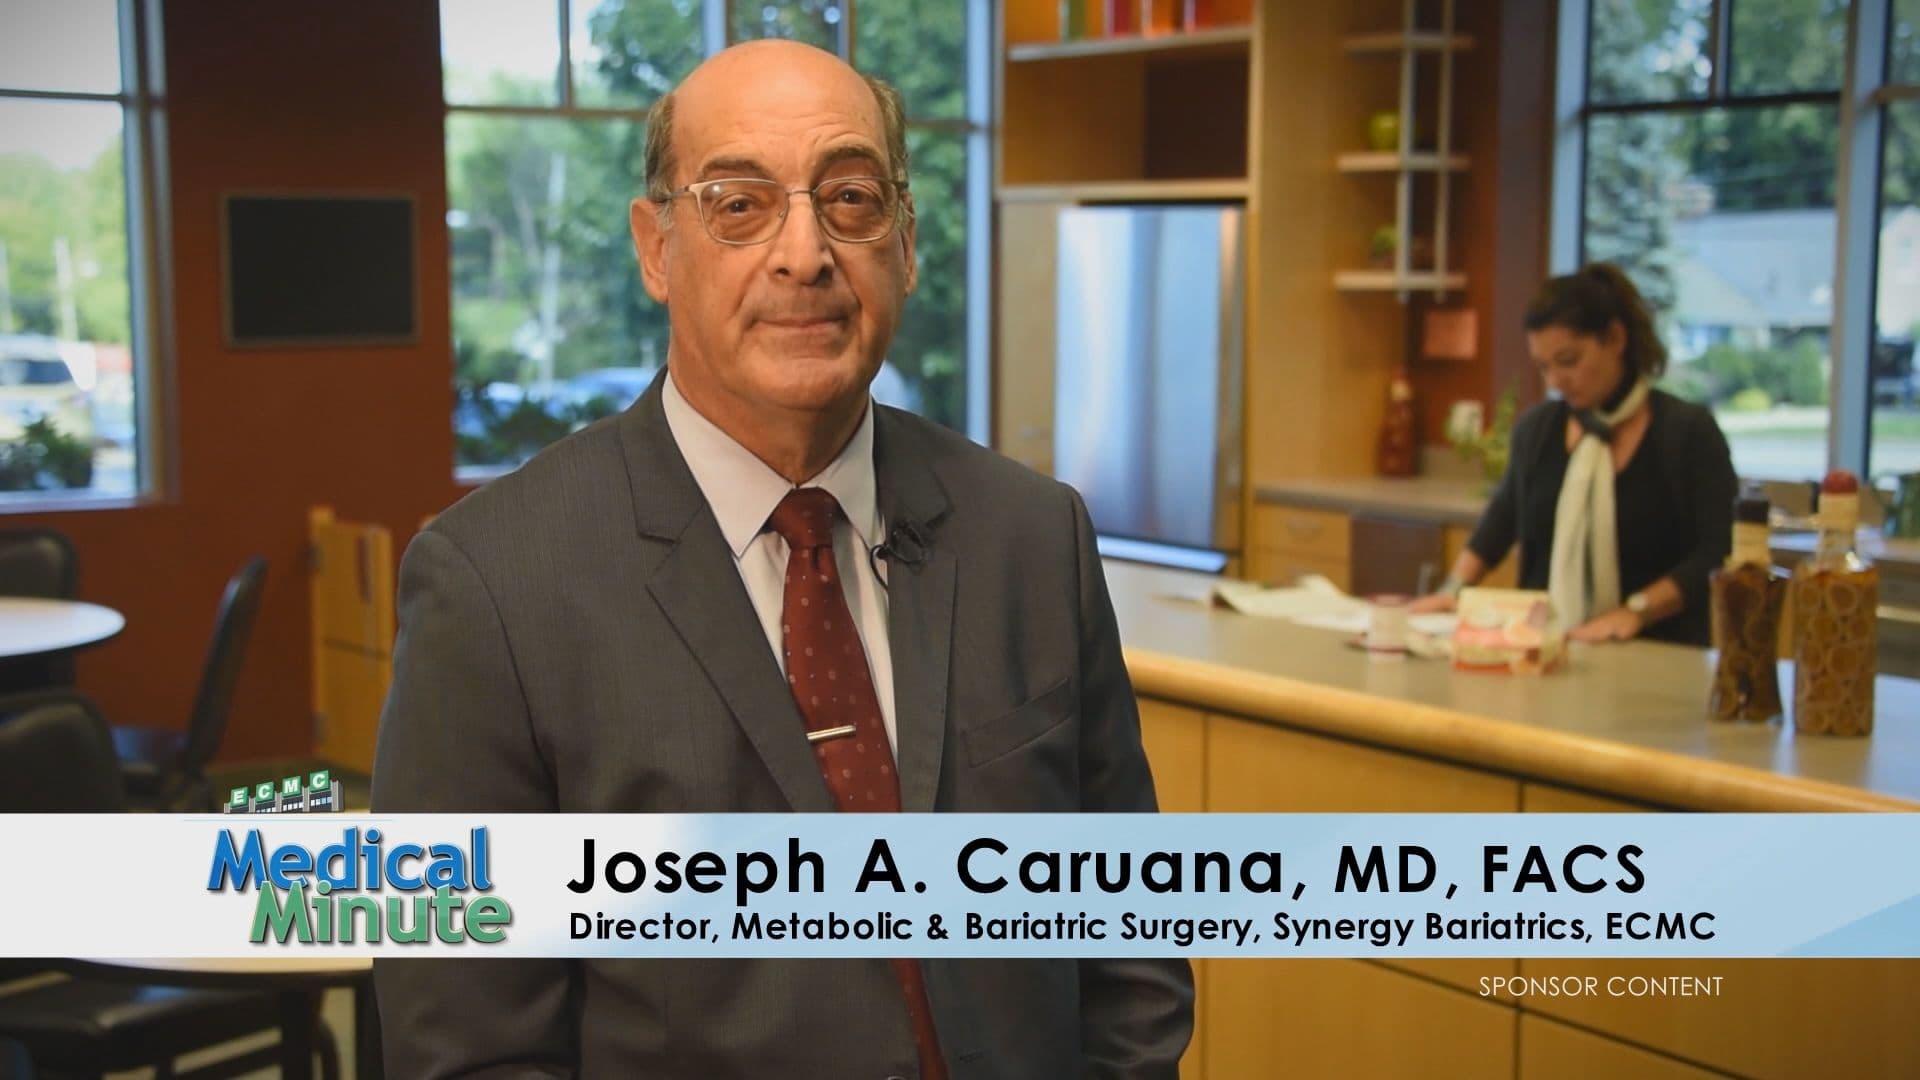 ECMCMedicalMinute Dr.Caruana MetabolicSurgery 010620 STILL